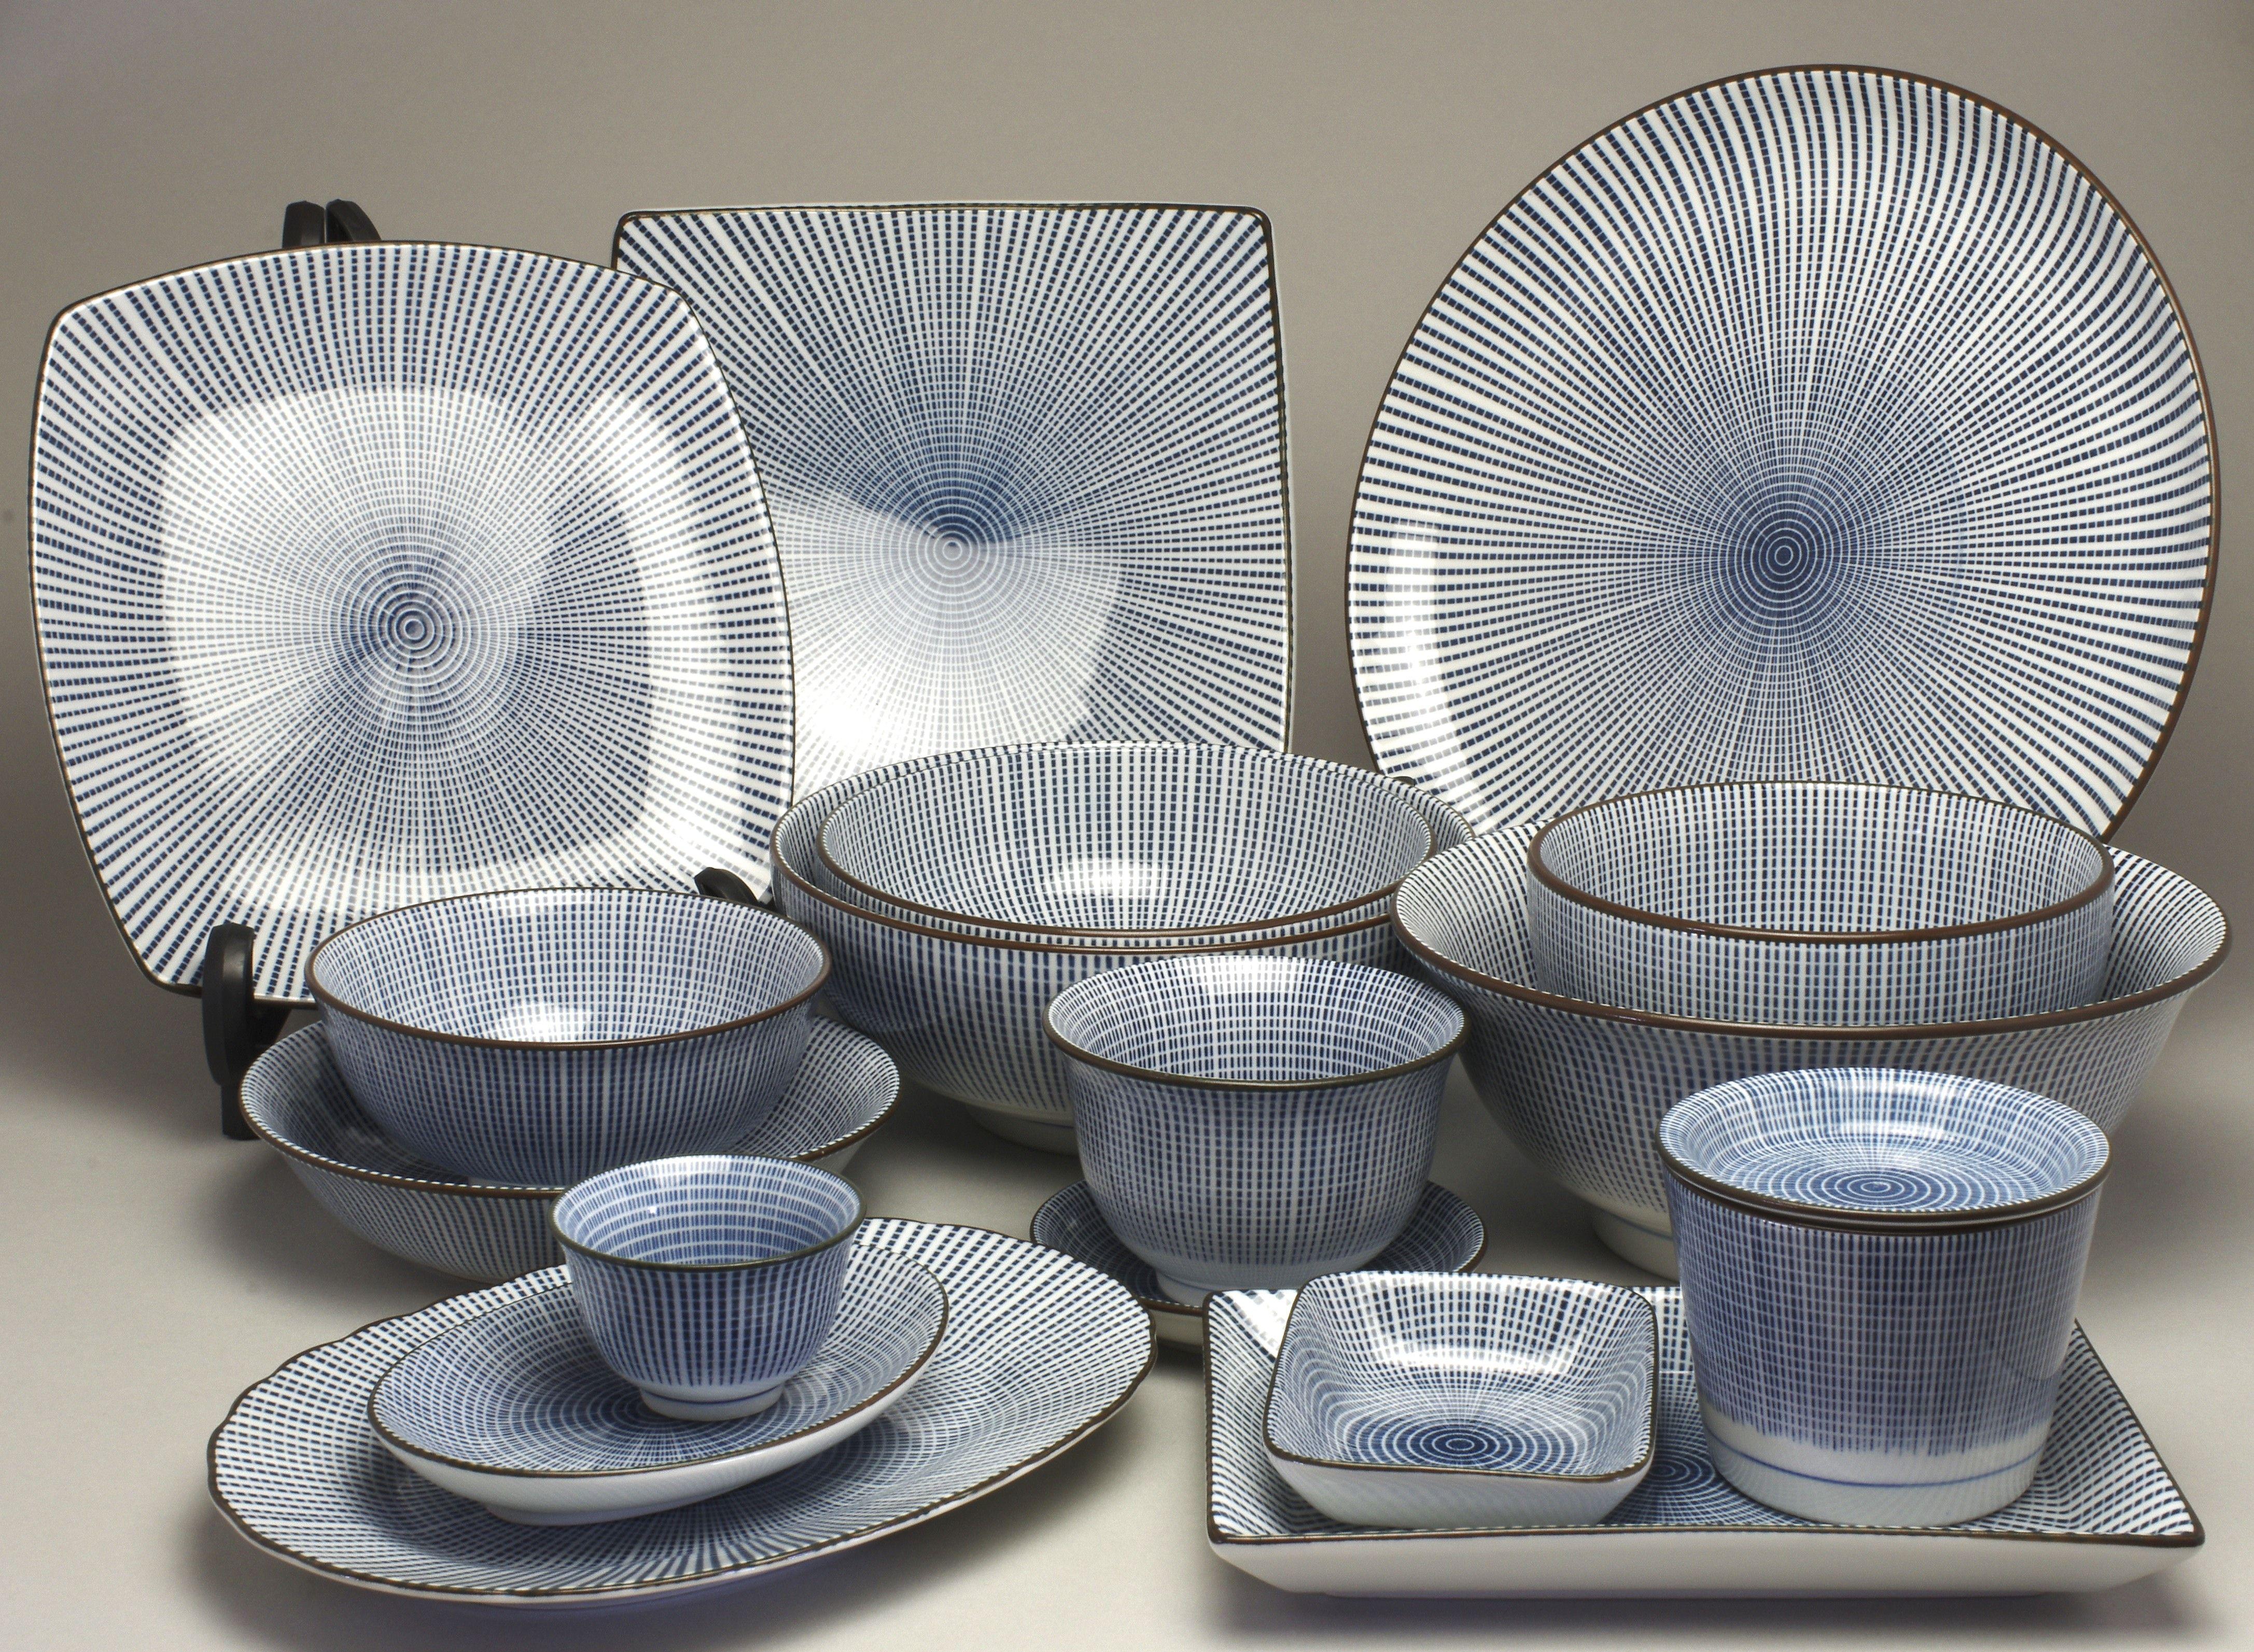 Sendan Tokusa Collection Products I Love In 2018 Pinterest Mooi Kimono Set Blue Rabbit Sushi Size S Japanese Pottery Studio Design Fine China Kitchenware Tableware